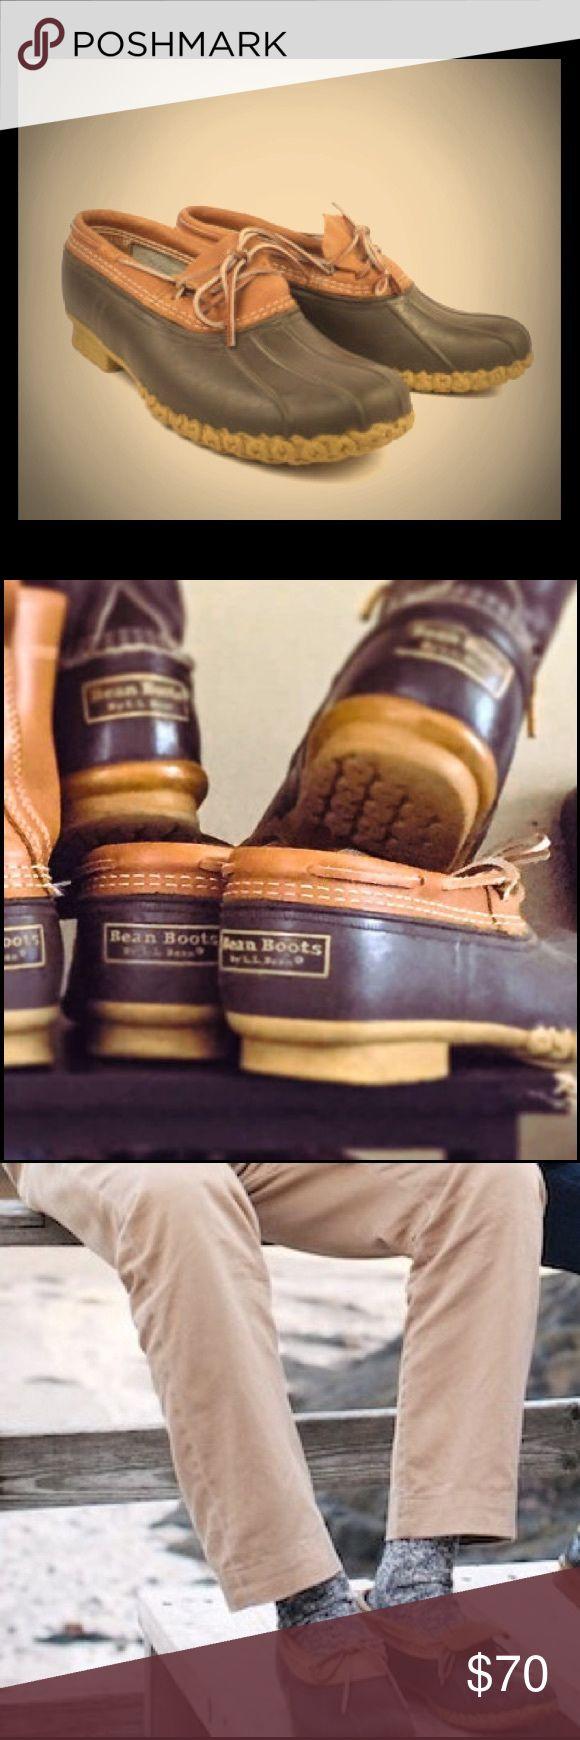 L.L. Bean Leather Rubber Bean Boots Men's Sz 9 L.L. Bean Leather Rubber Bean Boots Men's Sz 9        These are used but in great condition! L.L. Bean Shoes Rain & Snow Boots